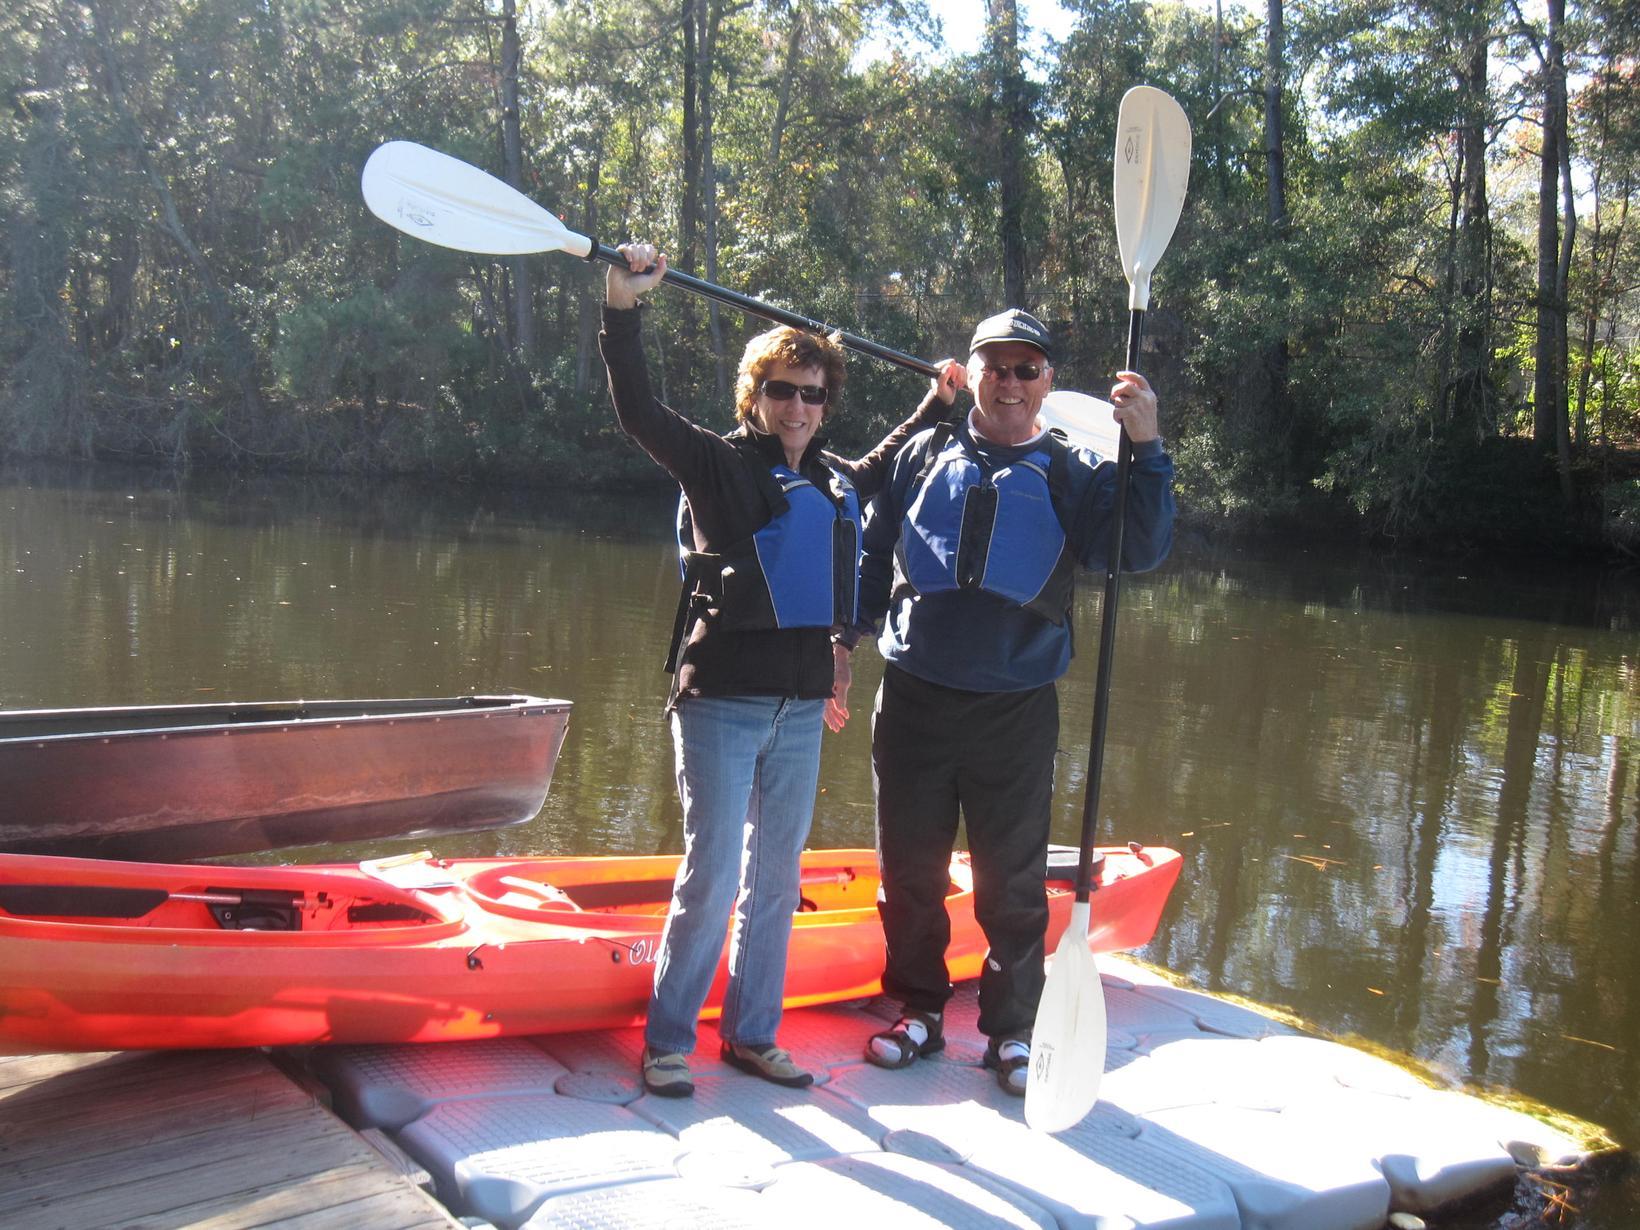 Trevor & Colleen from Hawkesbury, Ontario, Canada